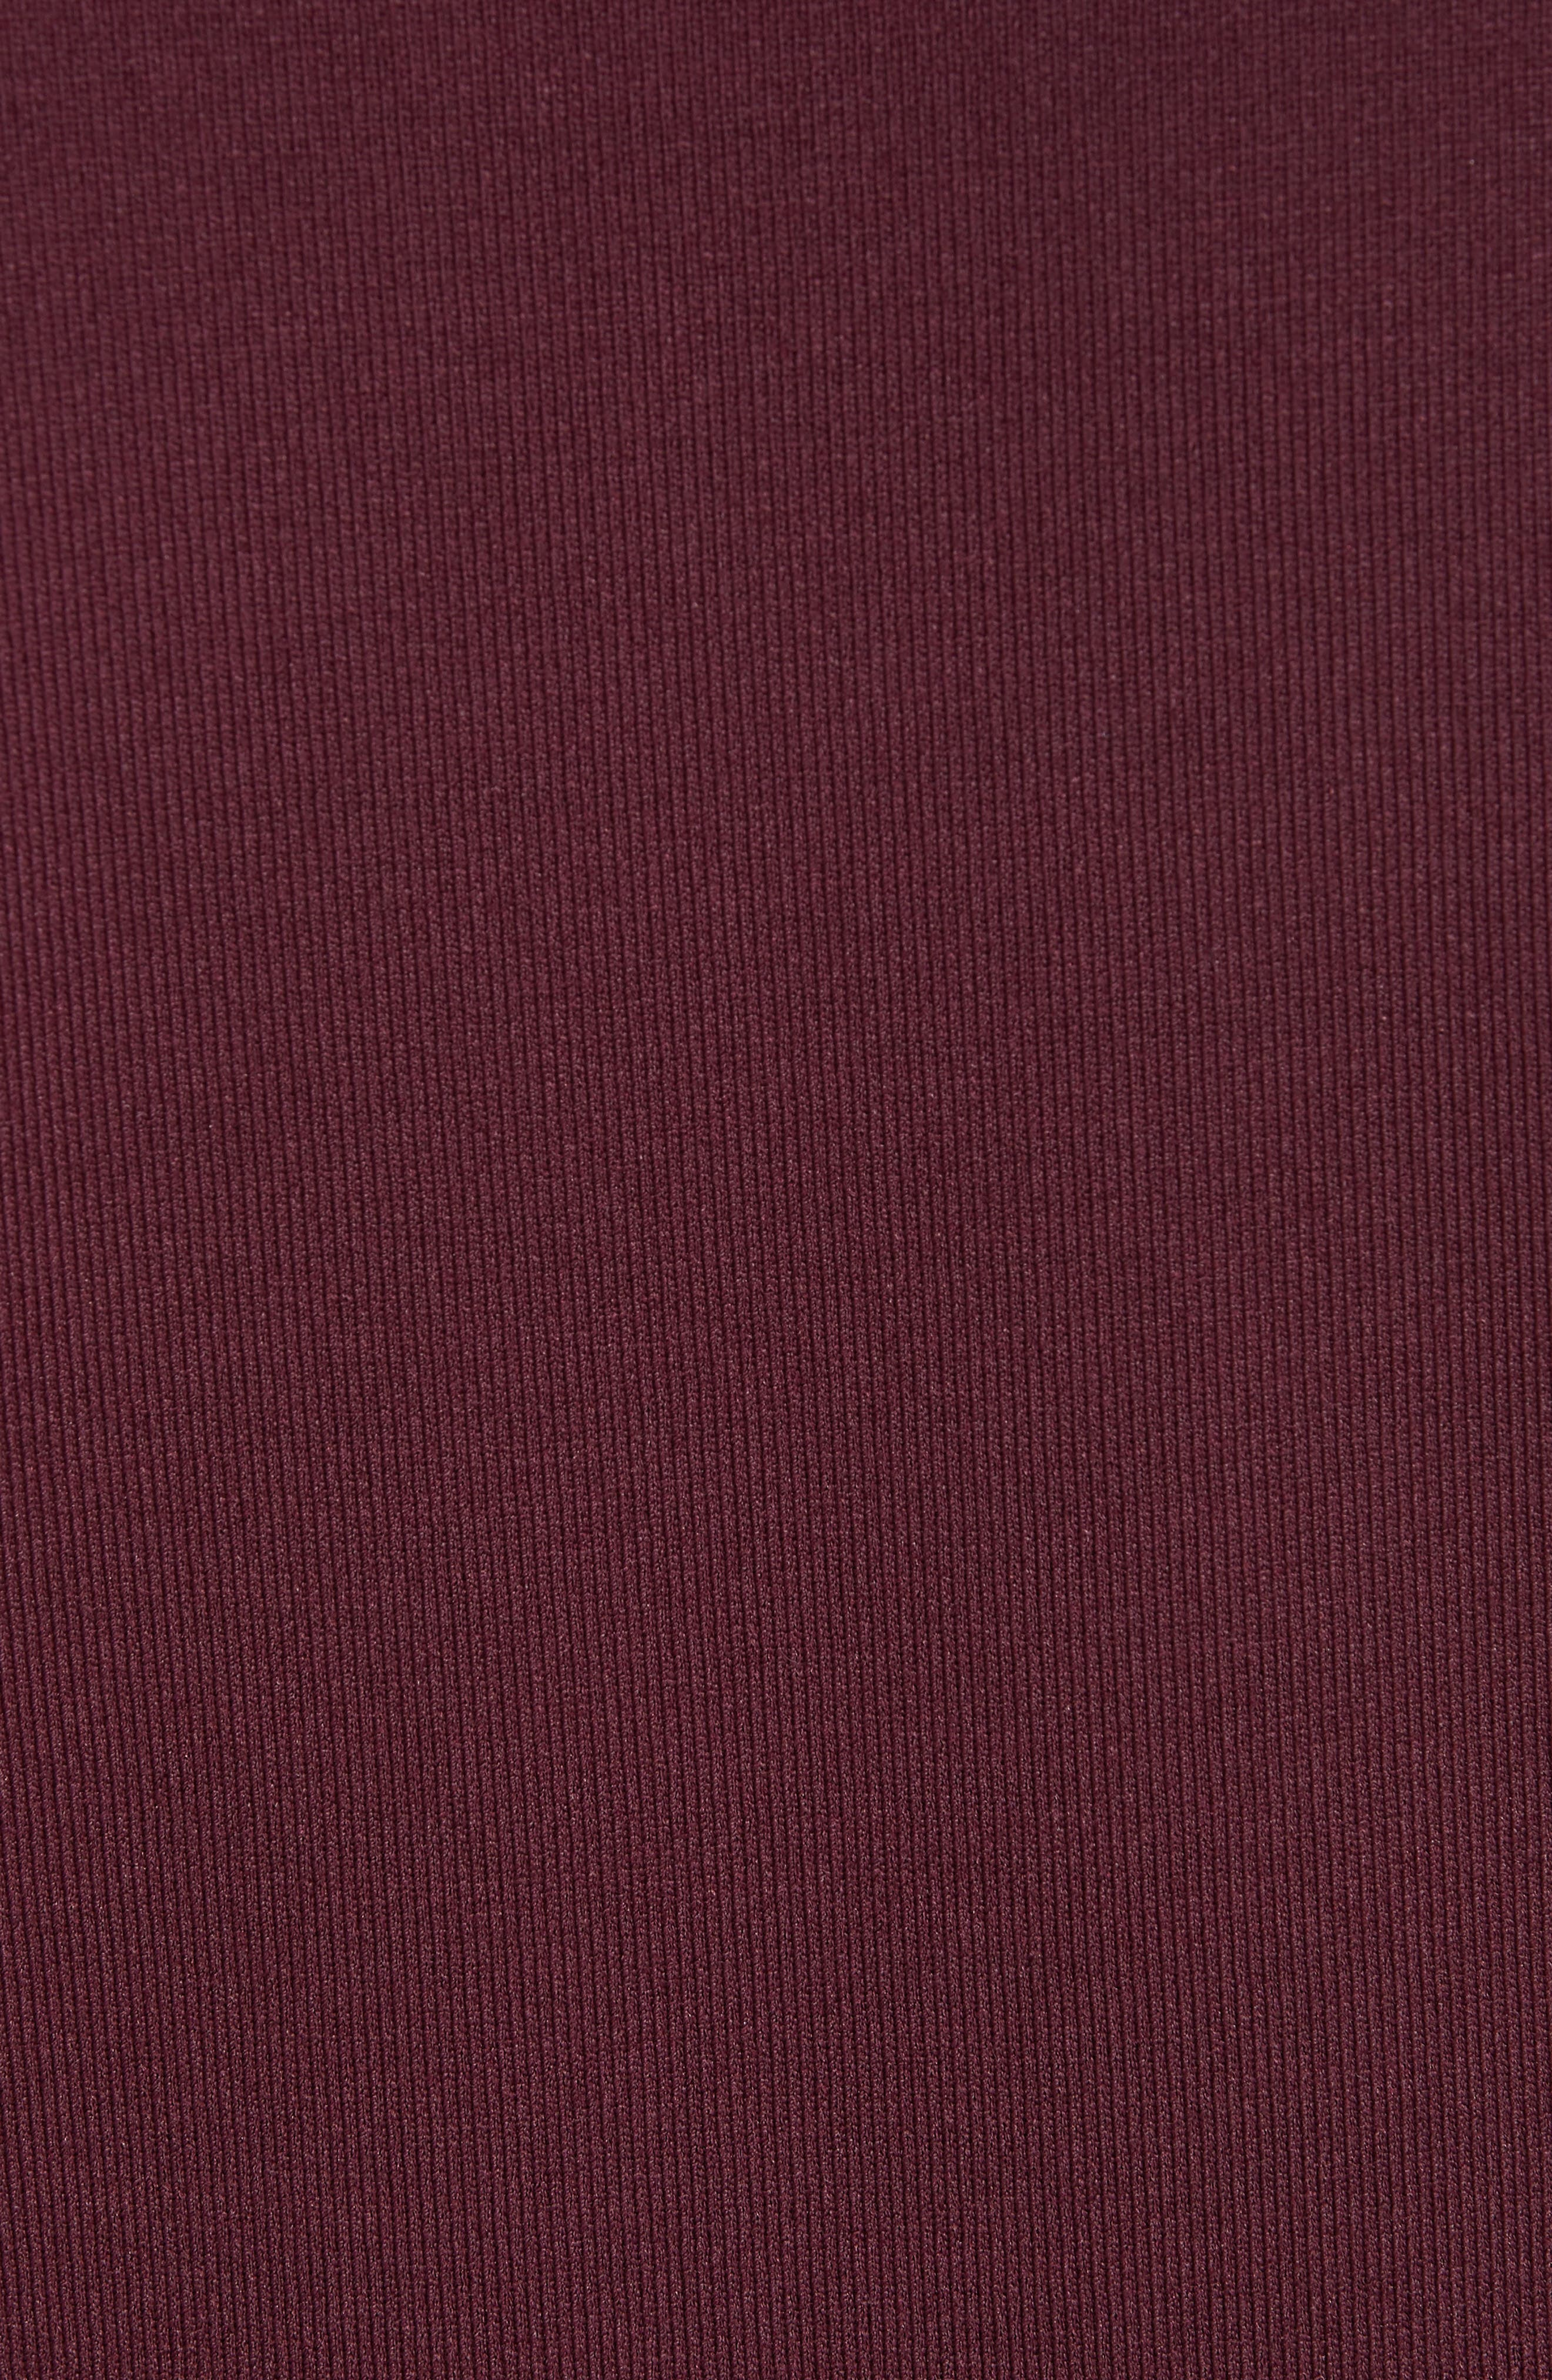 Montaigne Metallic Bead Fit & Flare Dress,                             Alternate thumbnail 5, color,                             613